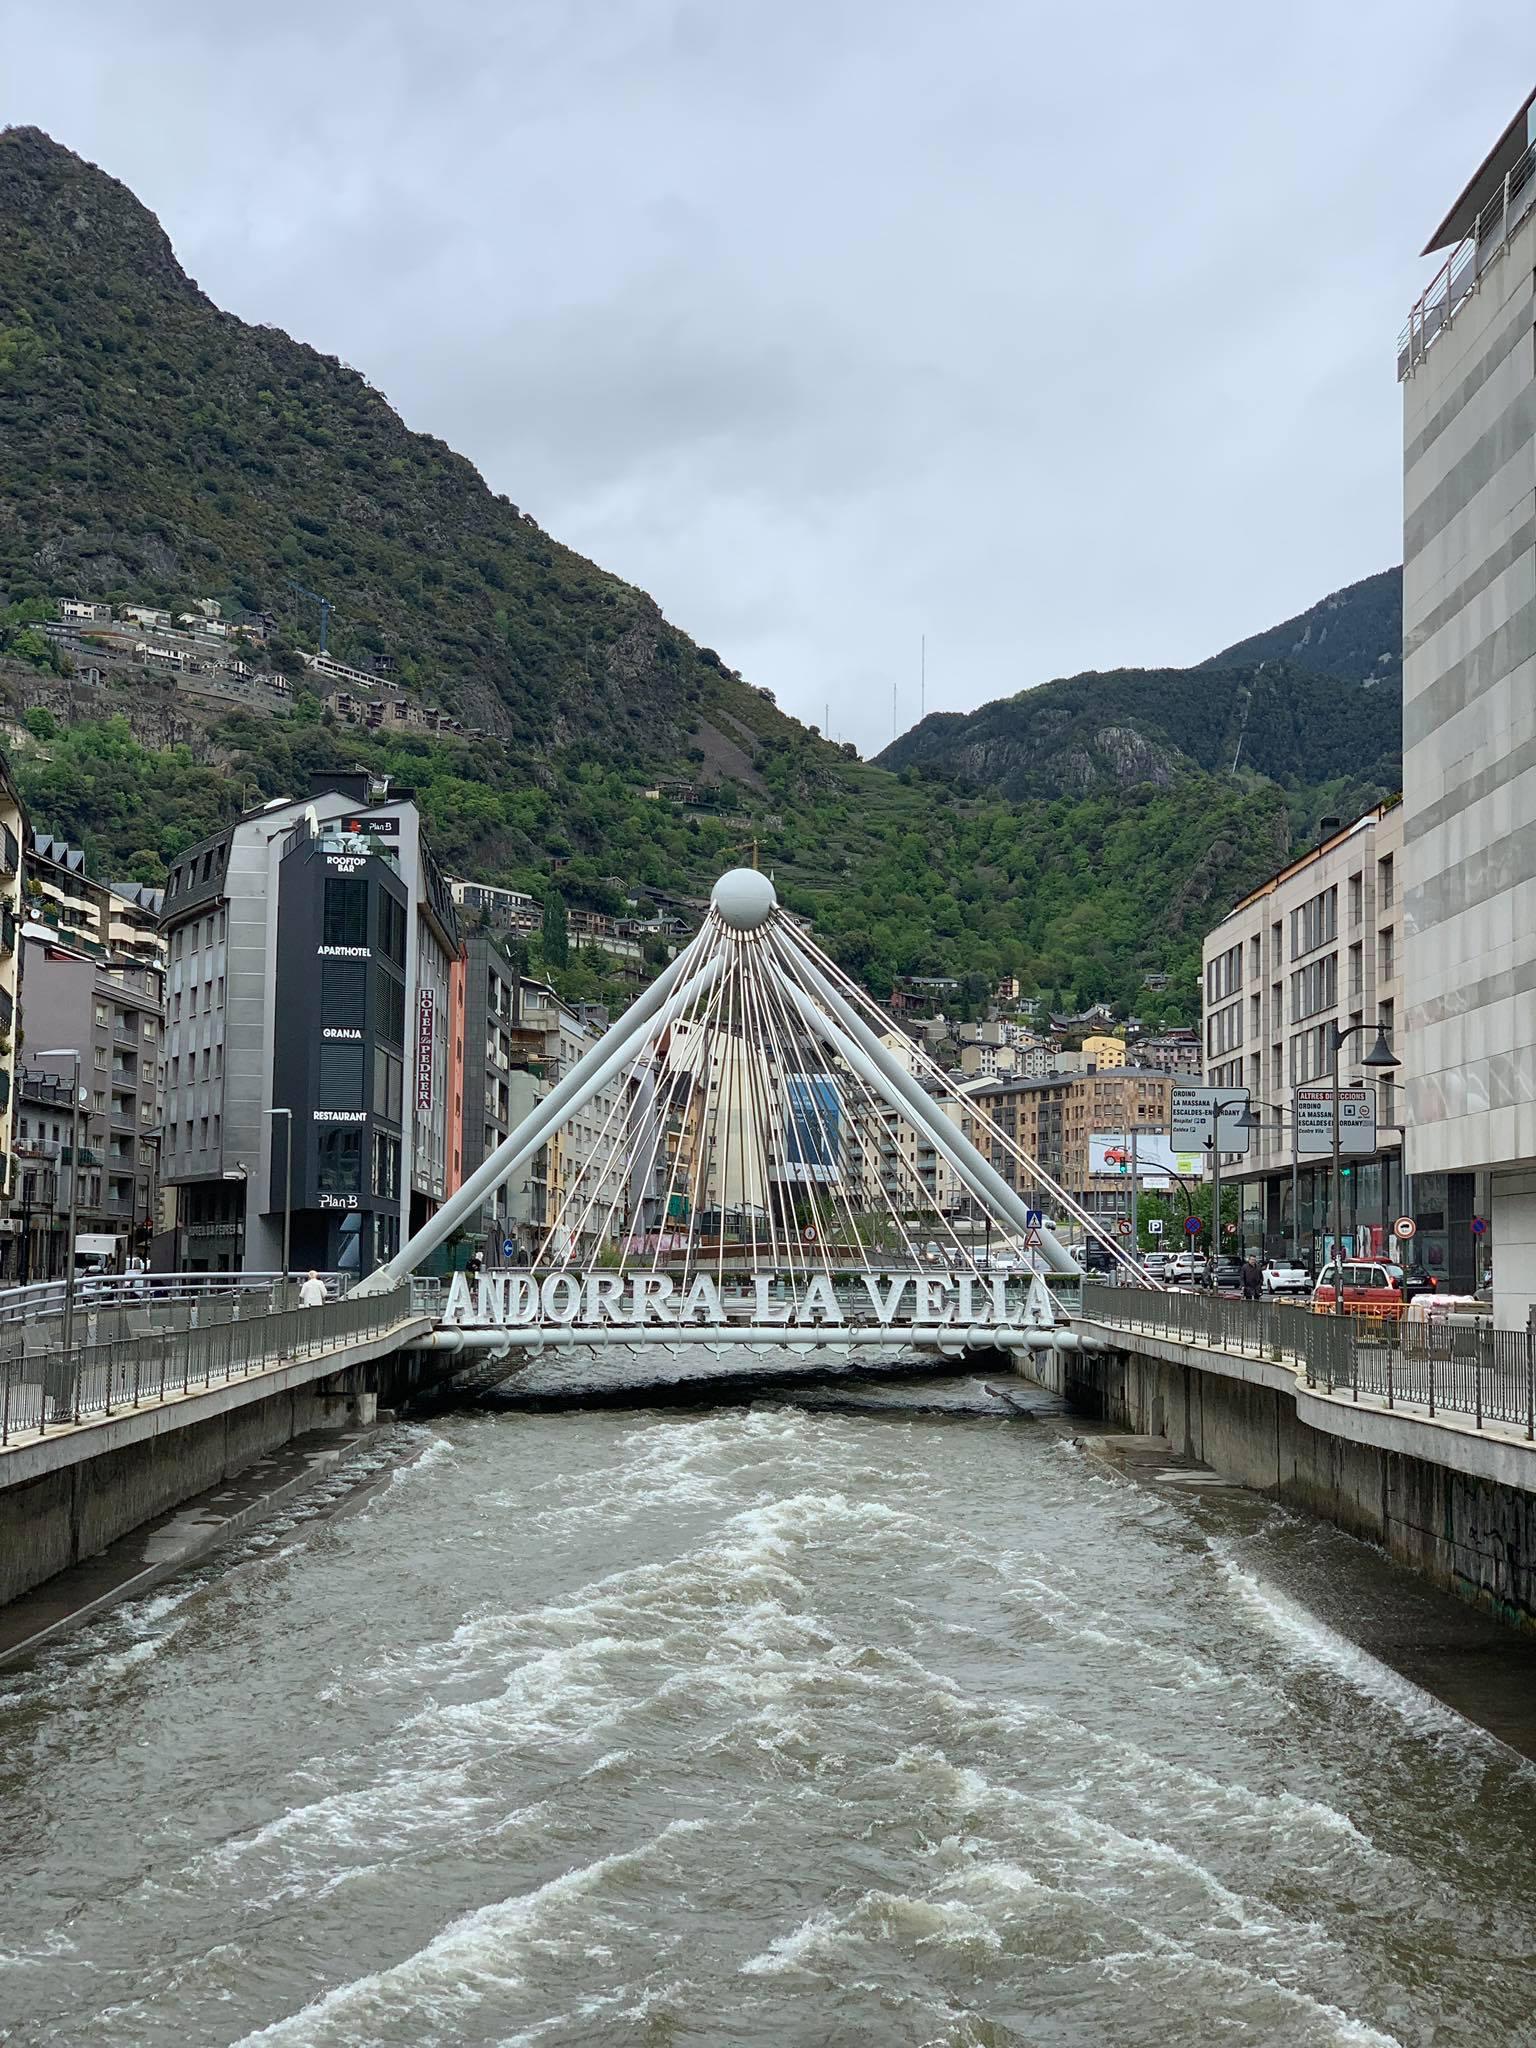 Andorra la Vella / Andorra